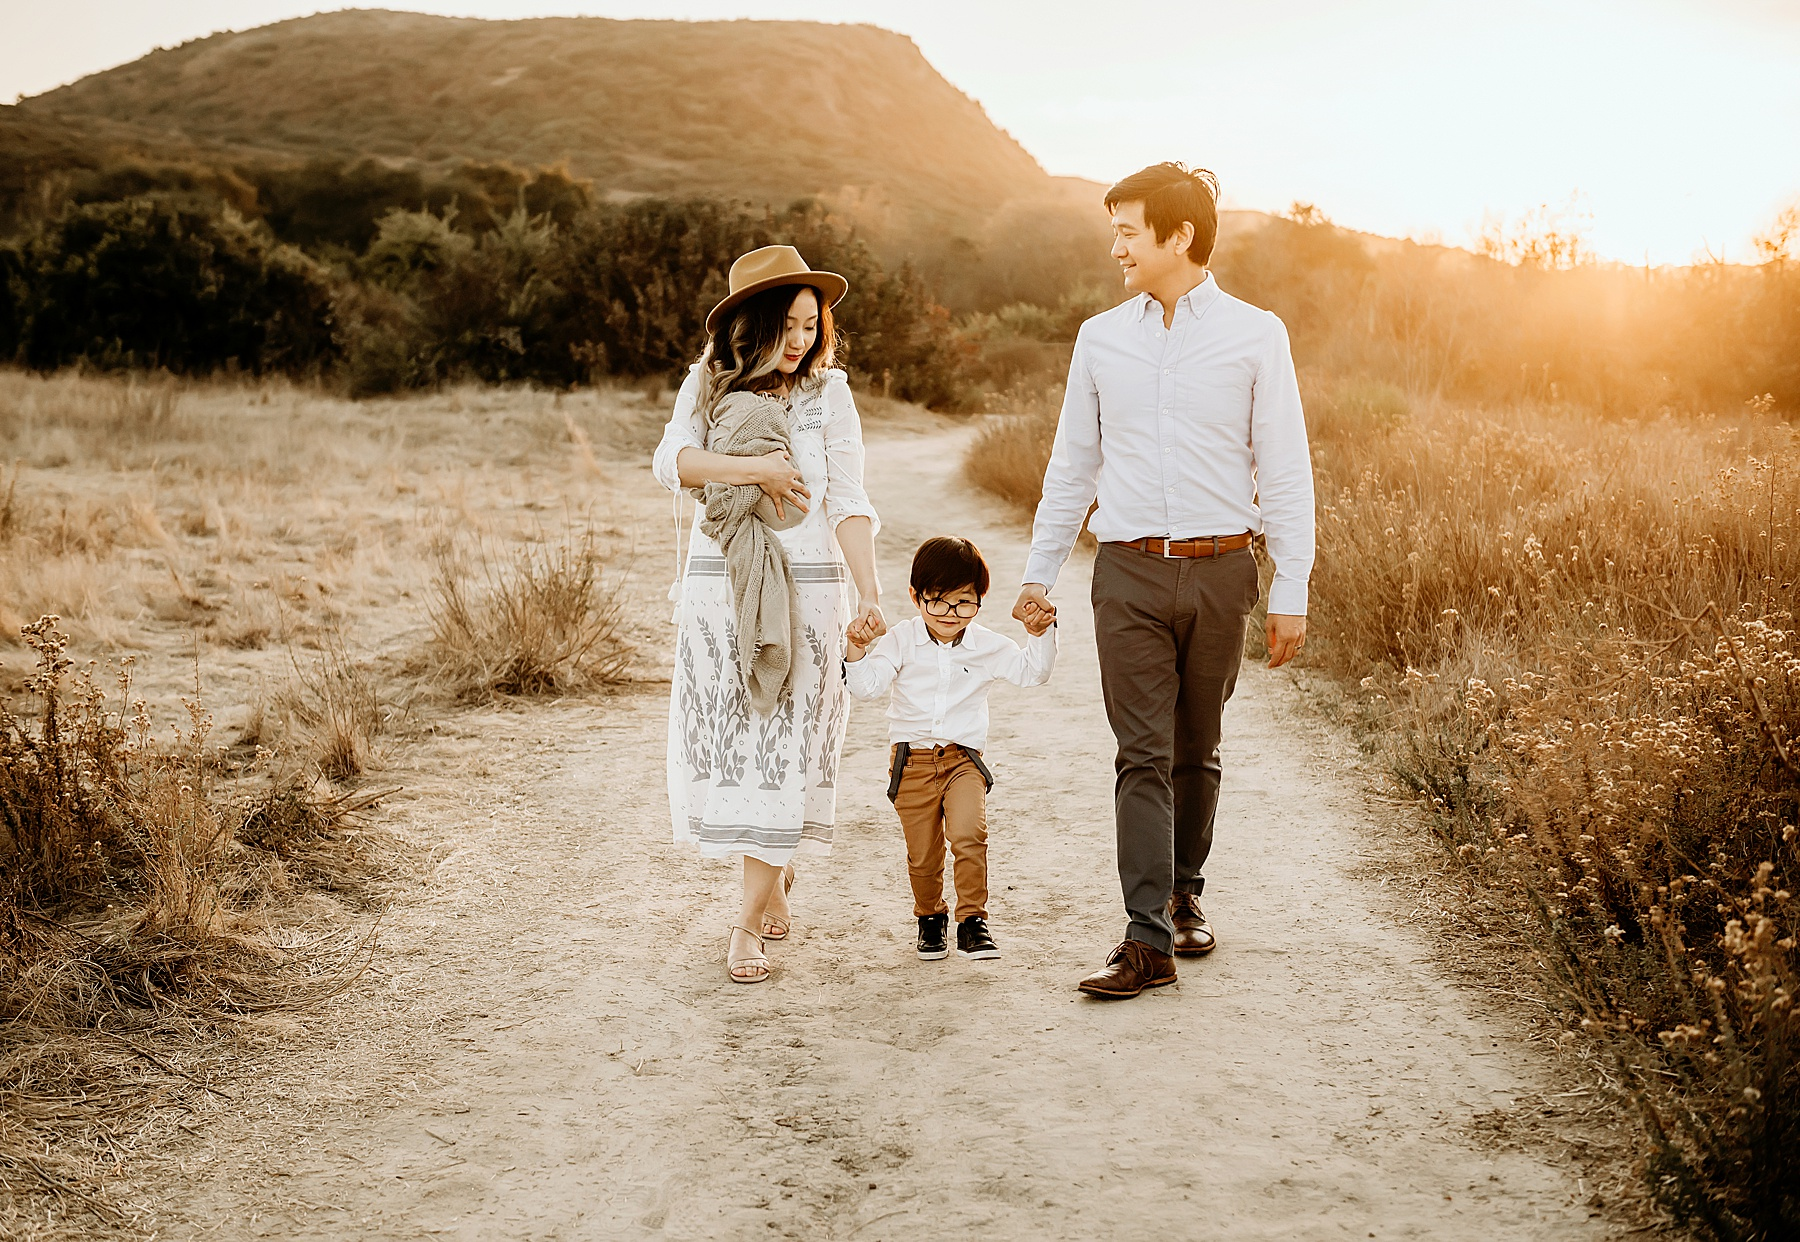 newborn pictures in open field family walking